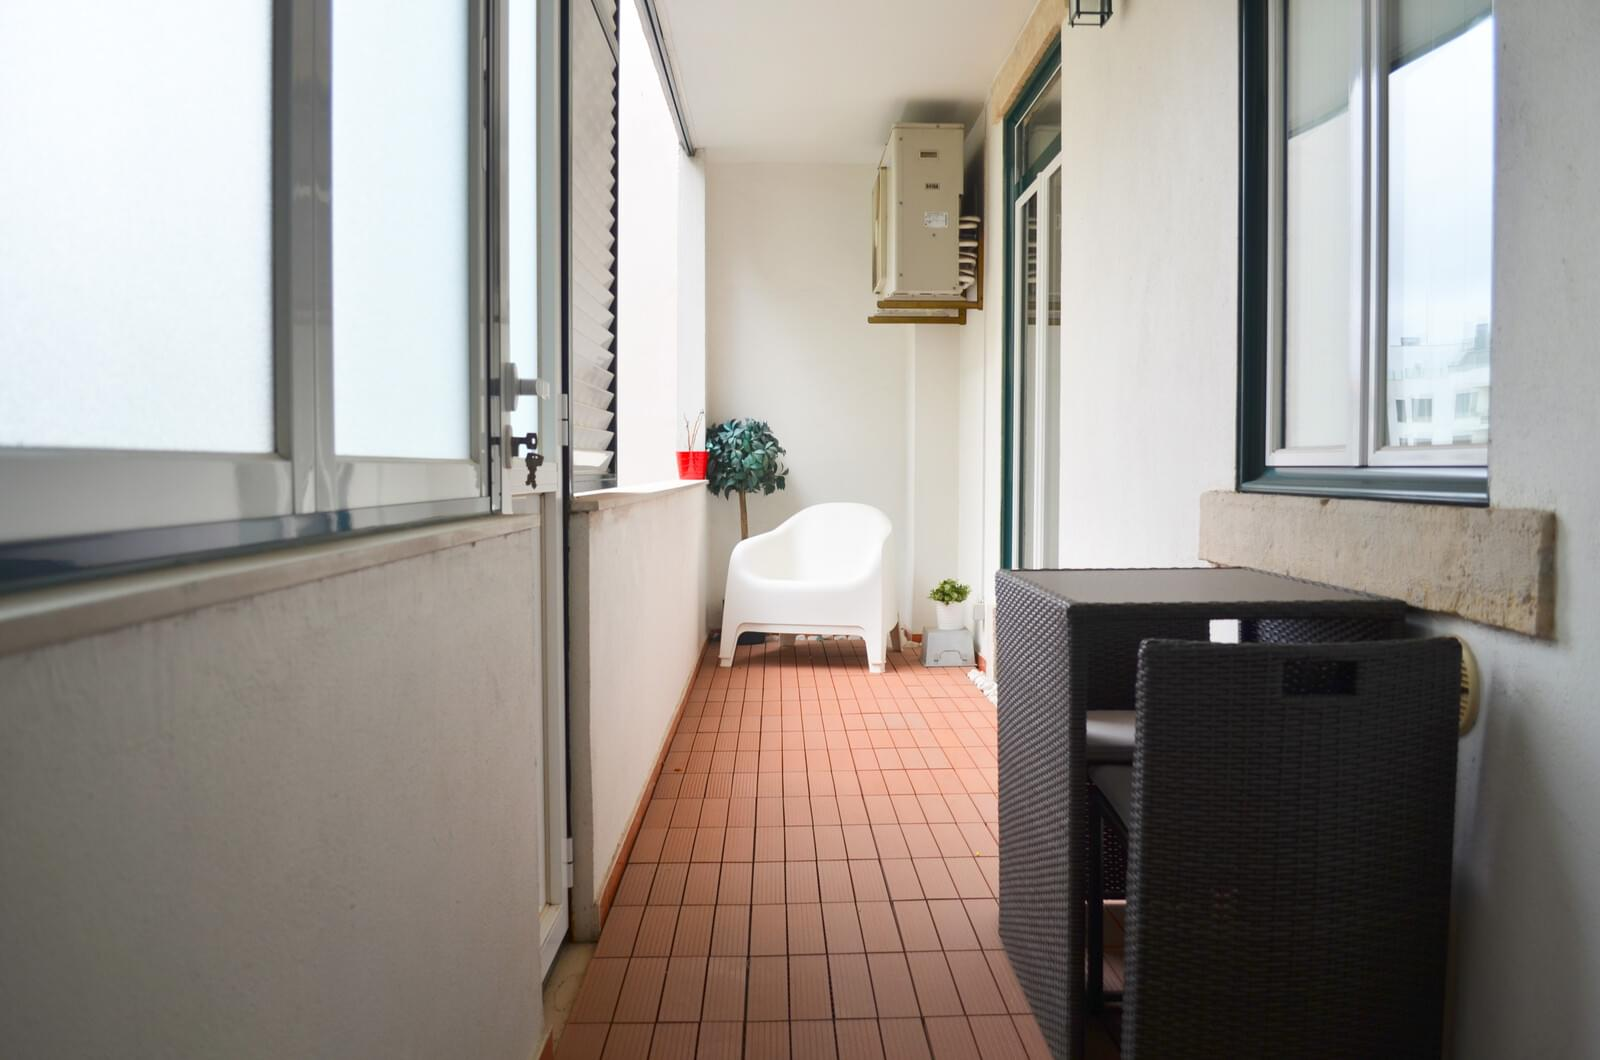 pf18839-apartamento-t2-lisboa-33e80f97-8b5d-49bc-81a8-a6d27ee7edda